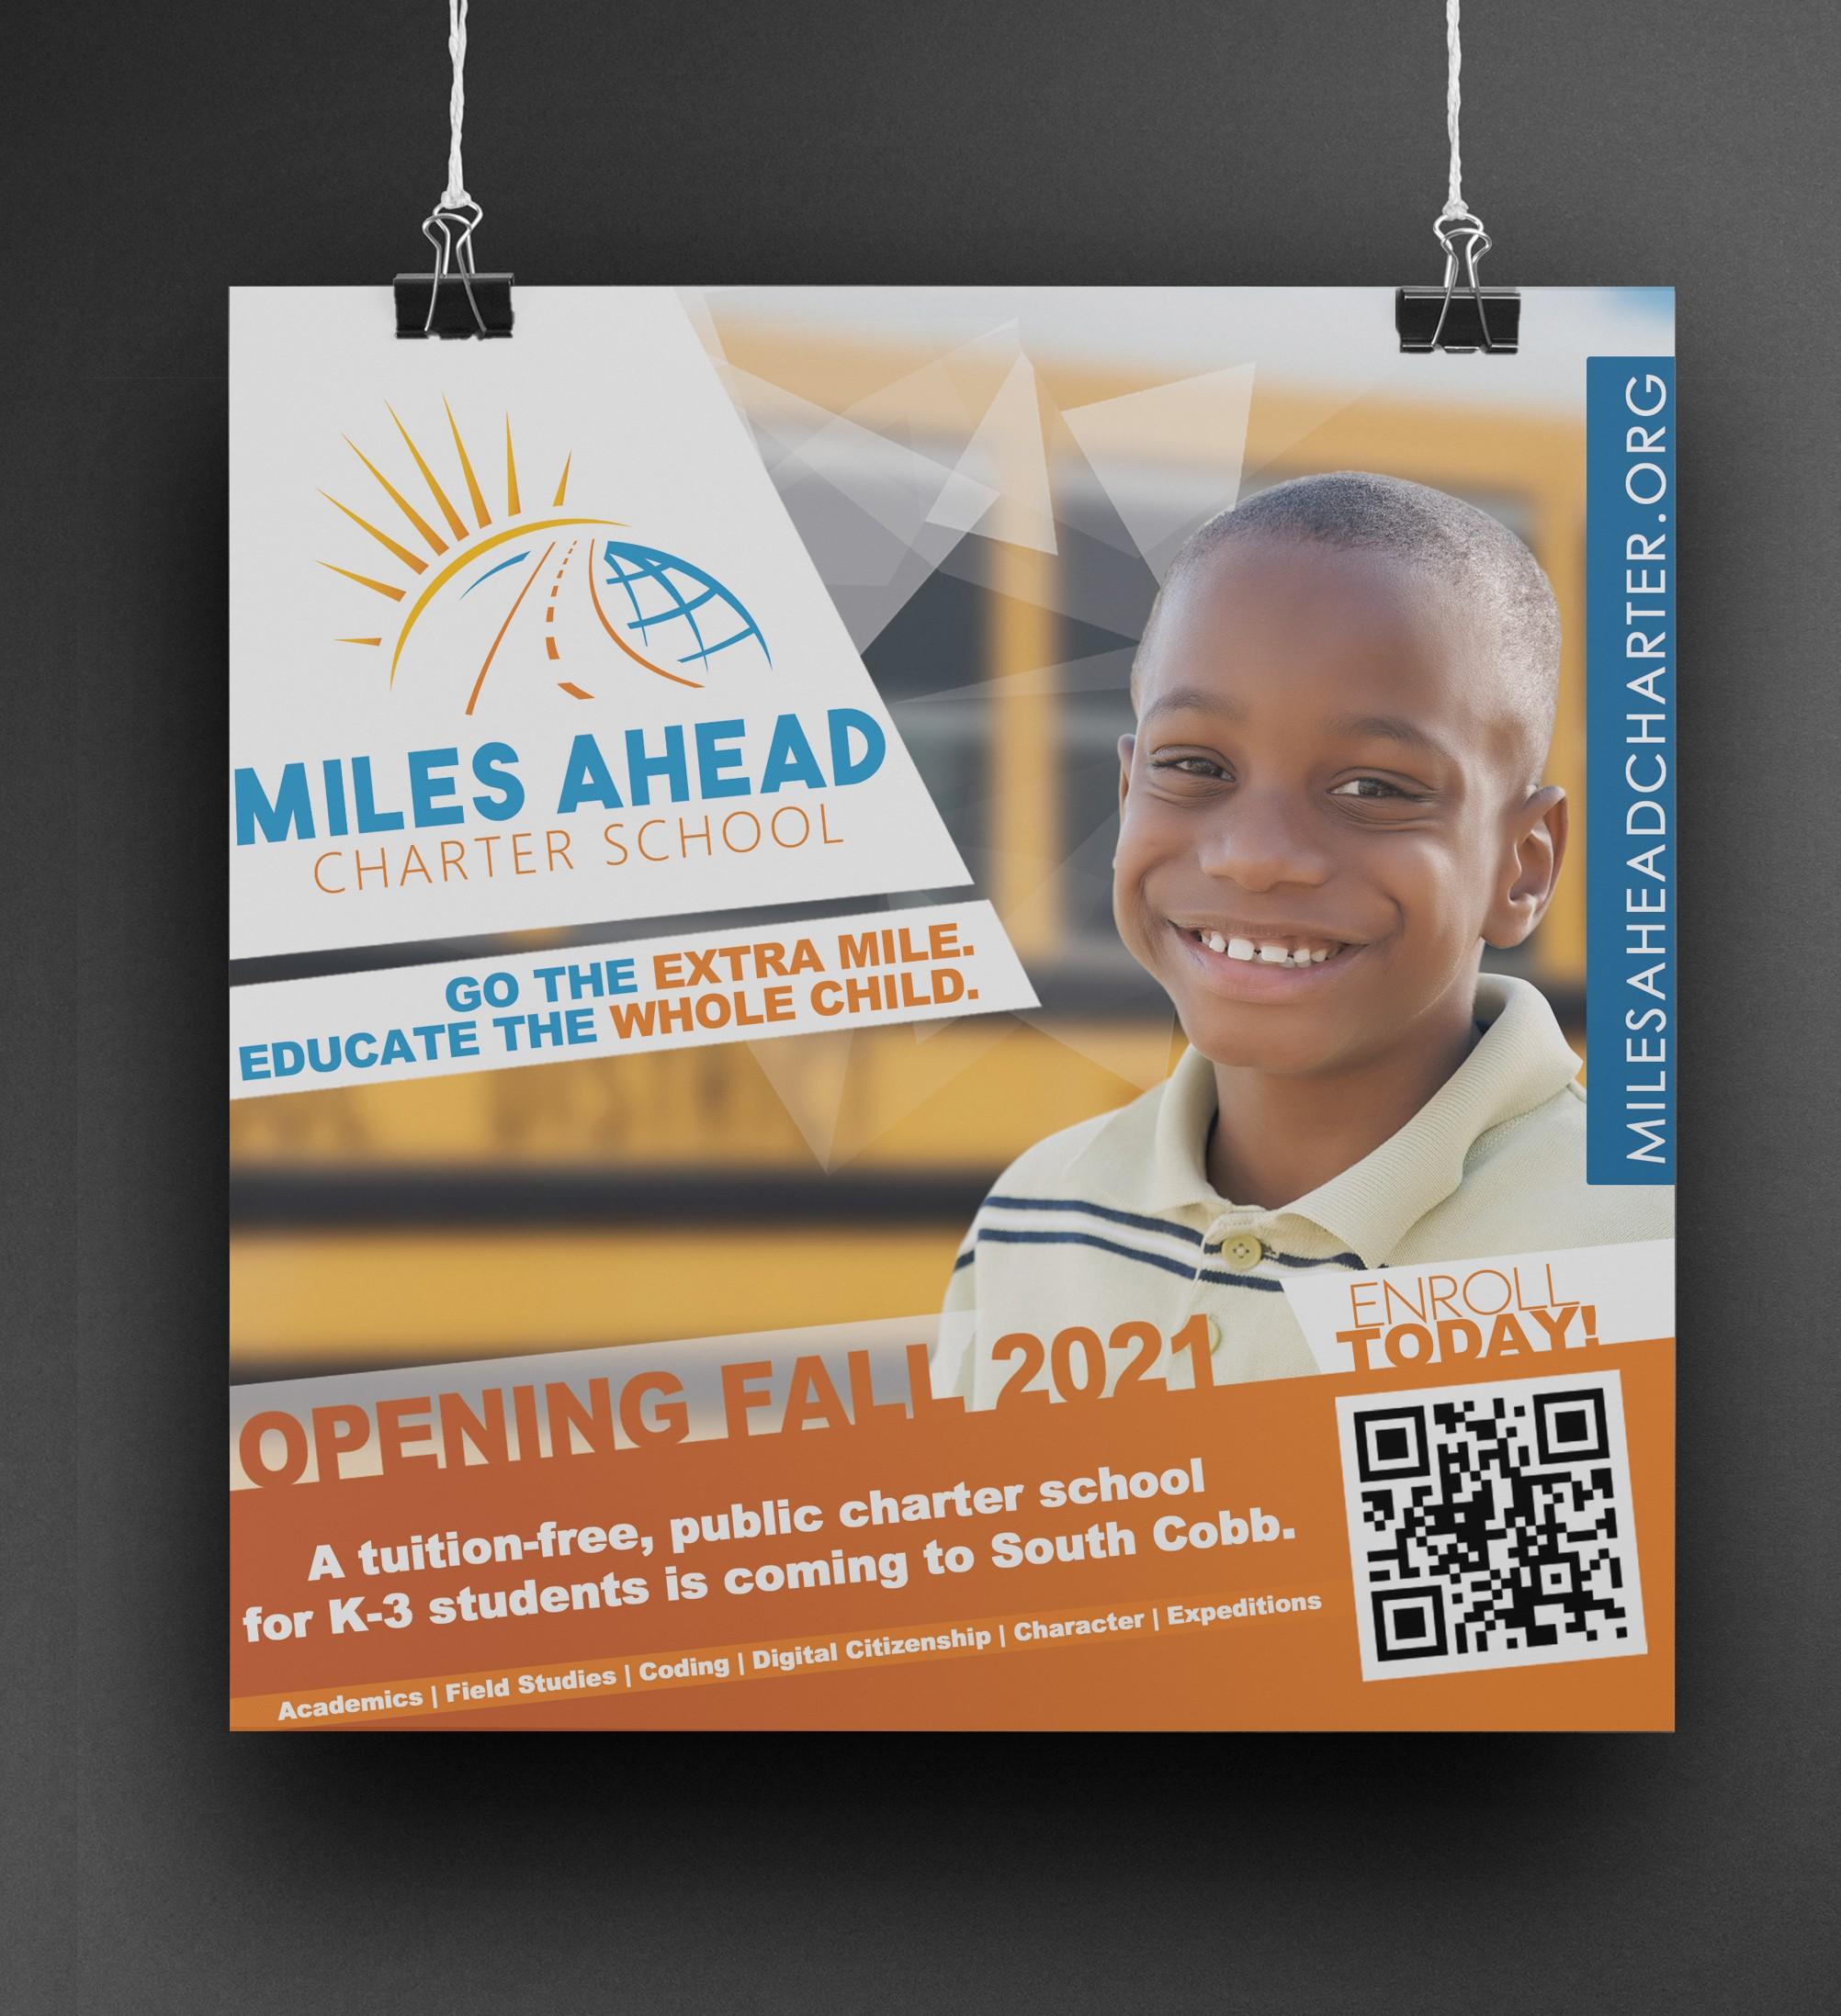 Miles Ahead Charter School Social Marketing